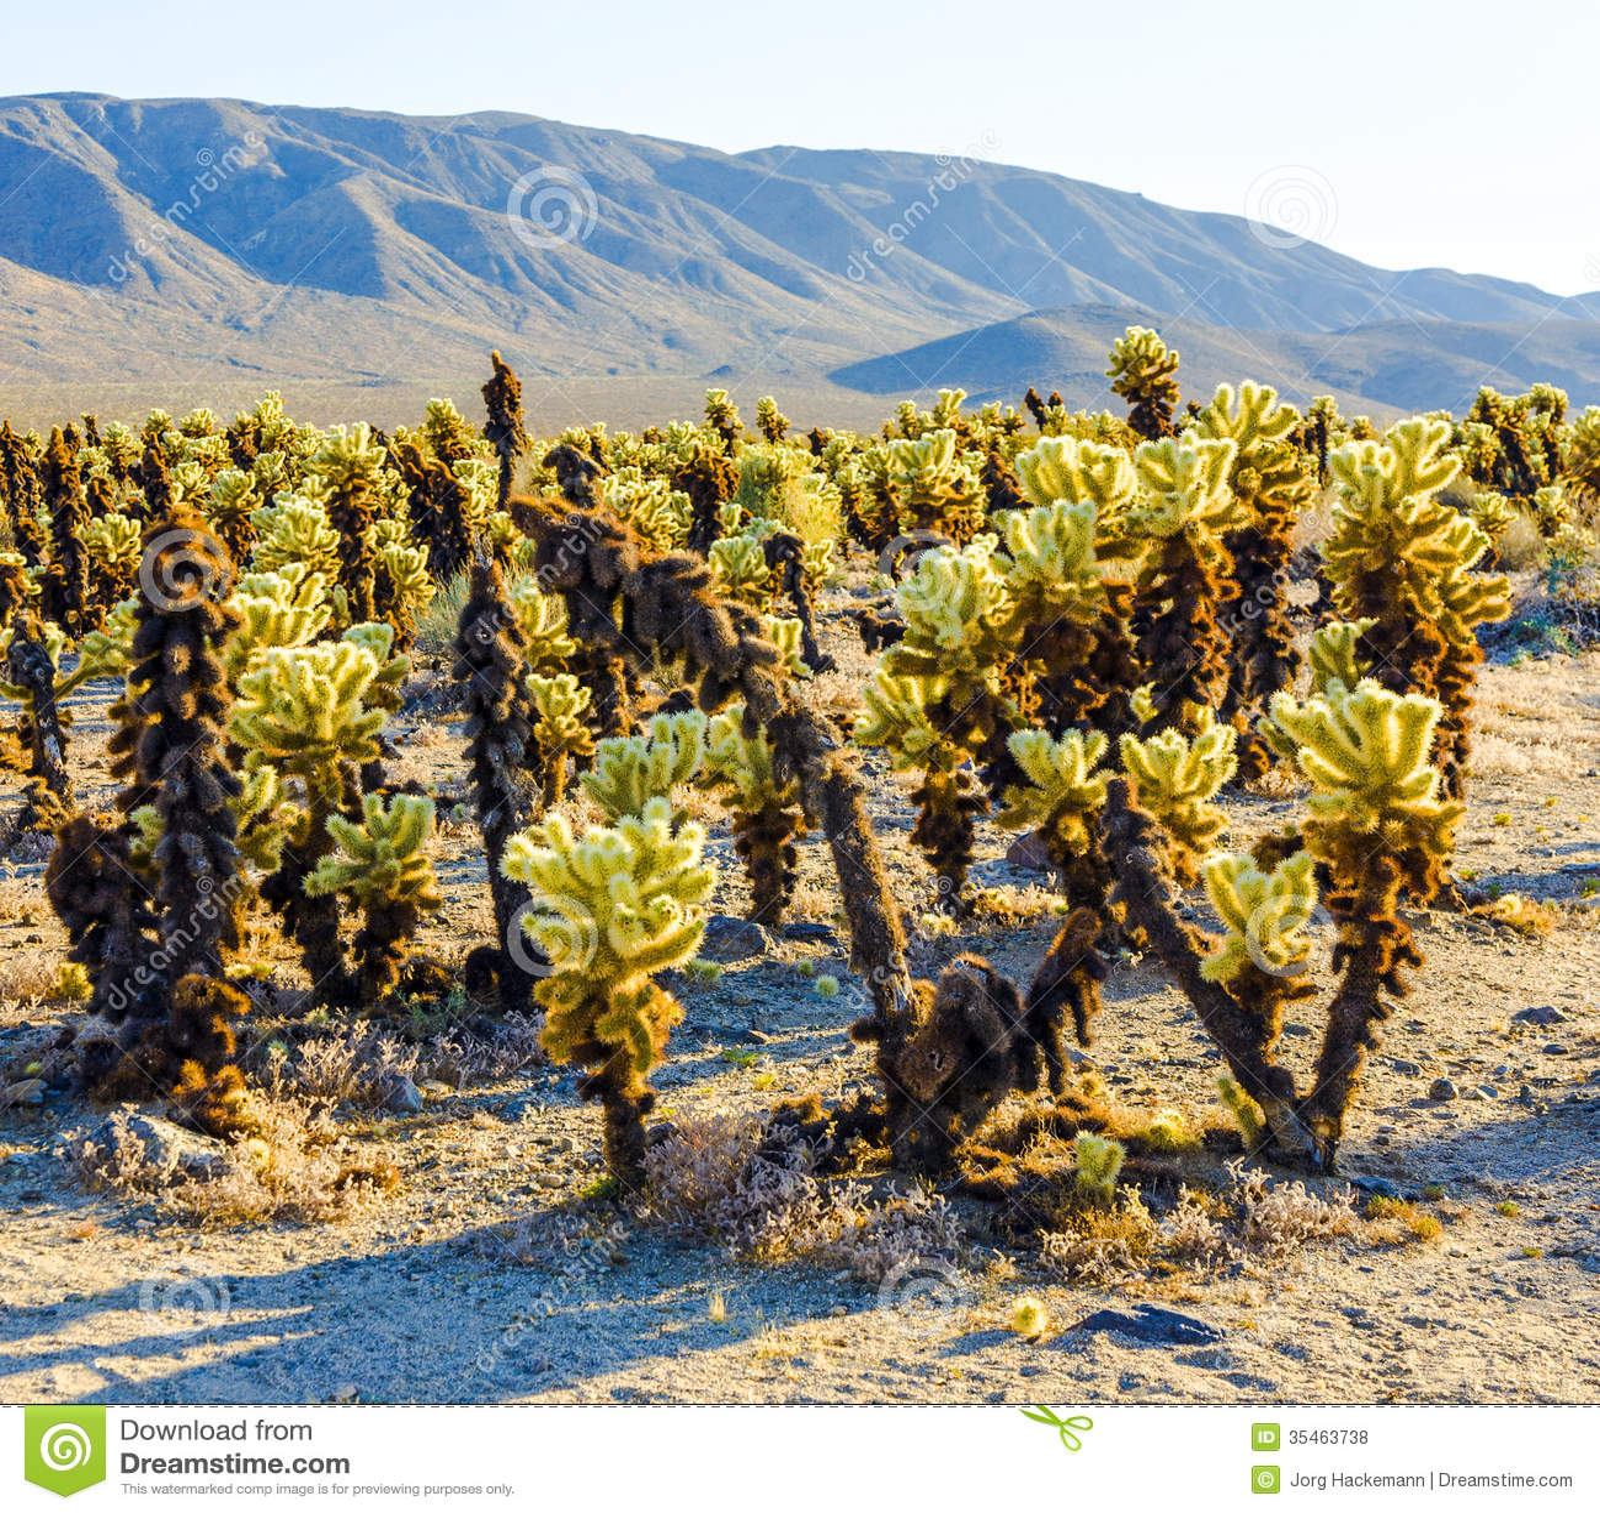 Beautiful Cholla Cactus Garden In Joshua Tree National Park Stock Photo Image 35463738